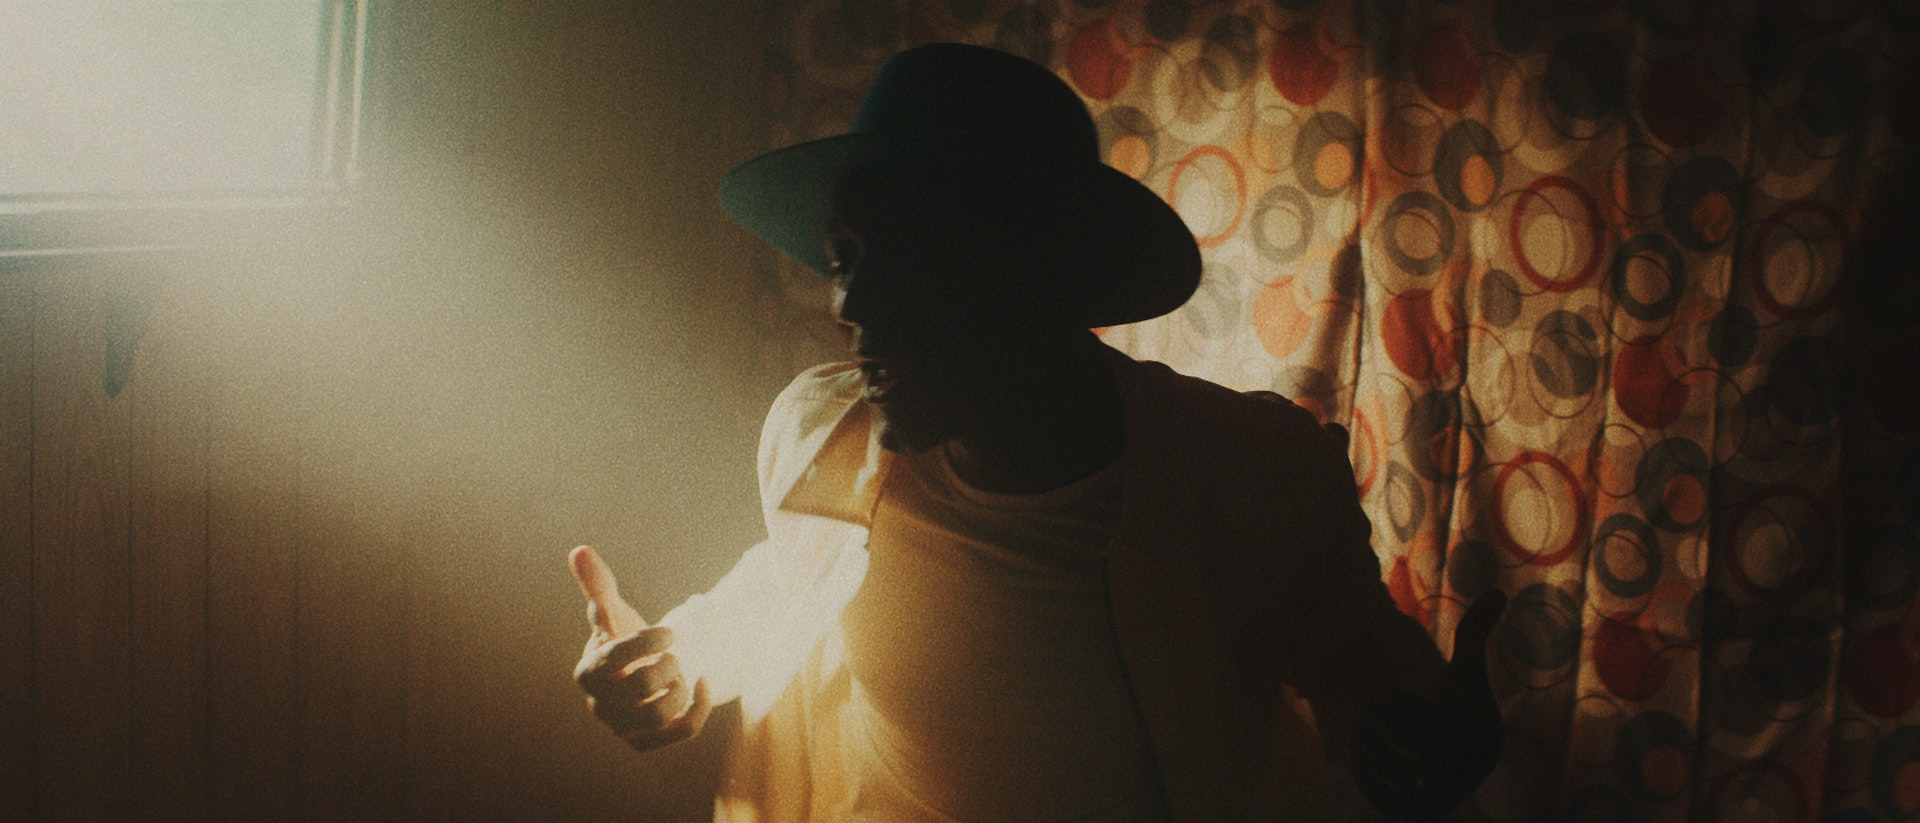 Hurt People | Gryffin ft. Aloe Blacc